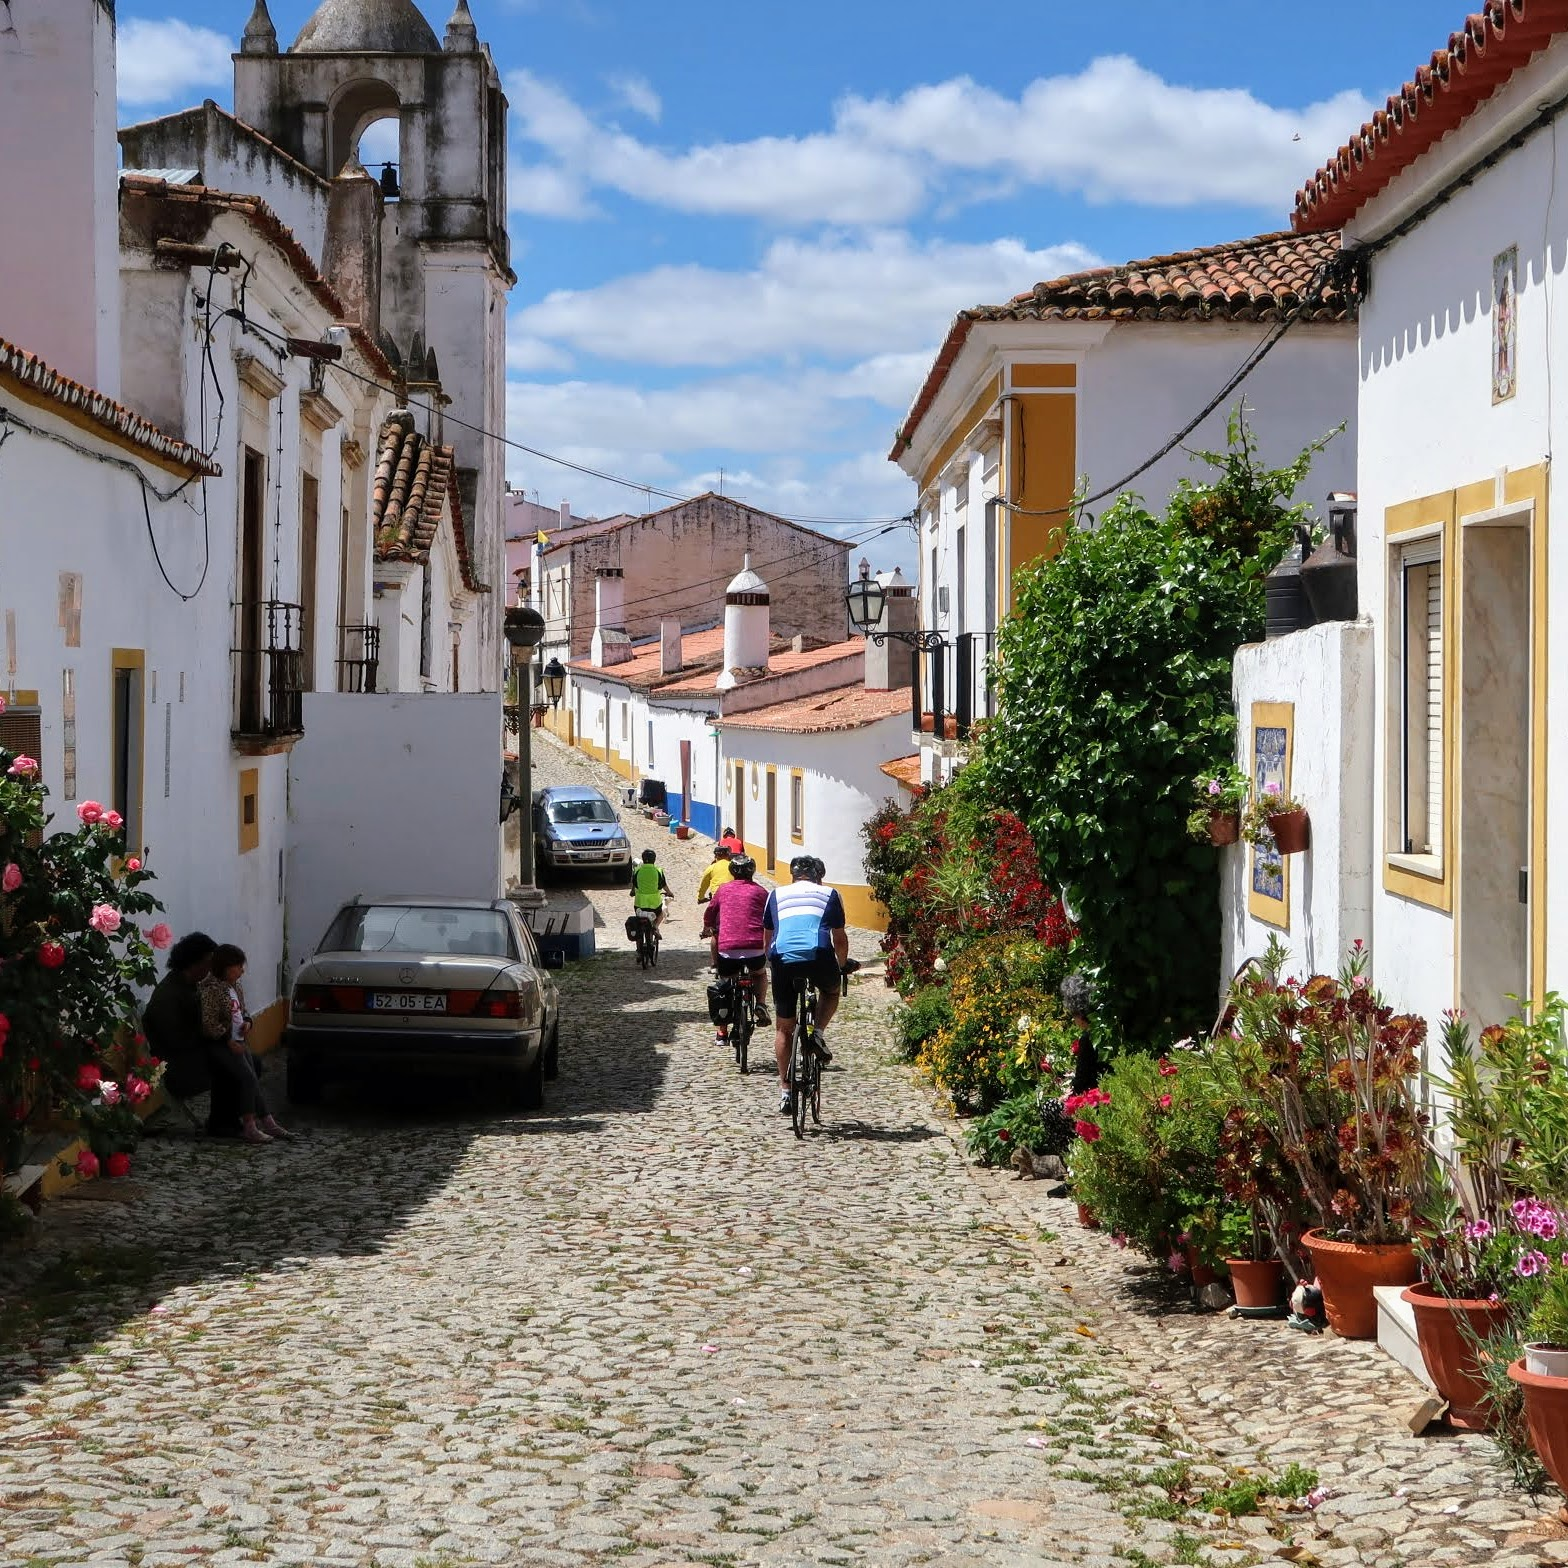 10 Best Biking Adventure Destinations Across Spain and Portugal - Alentejo